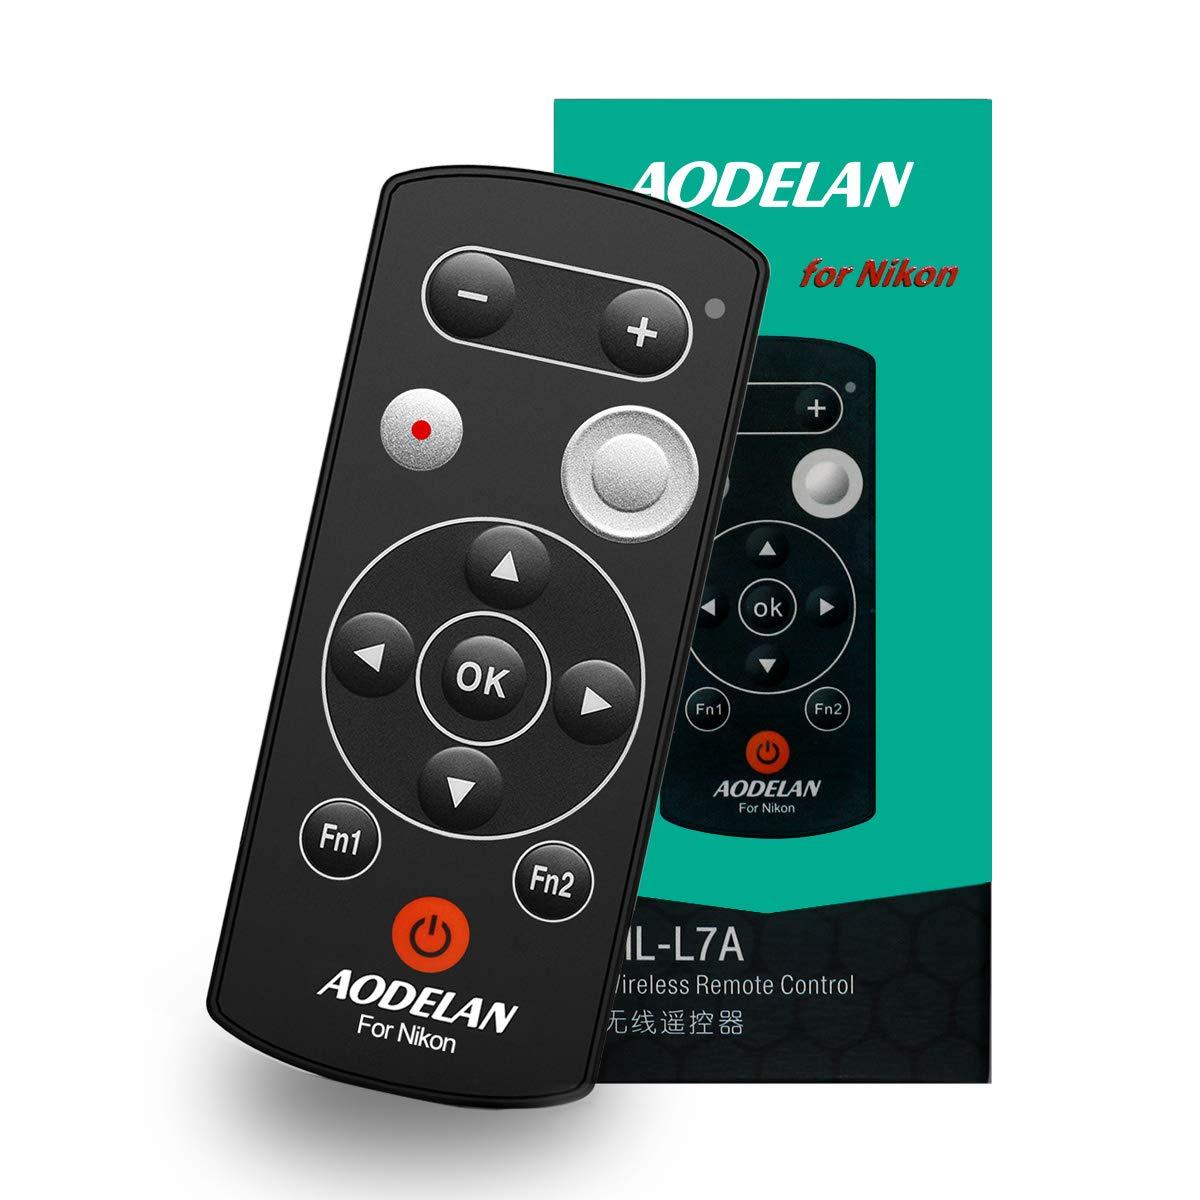 AODELAN Camera Remote Control - Wireless Shutter Release for Nikon B600 A1000 COOLPIX P1000, Replaces Nikon ML-L7